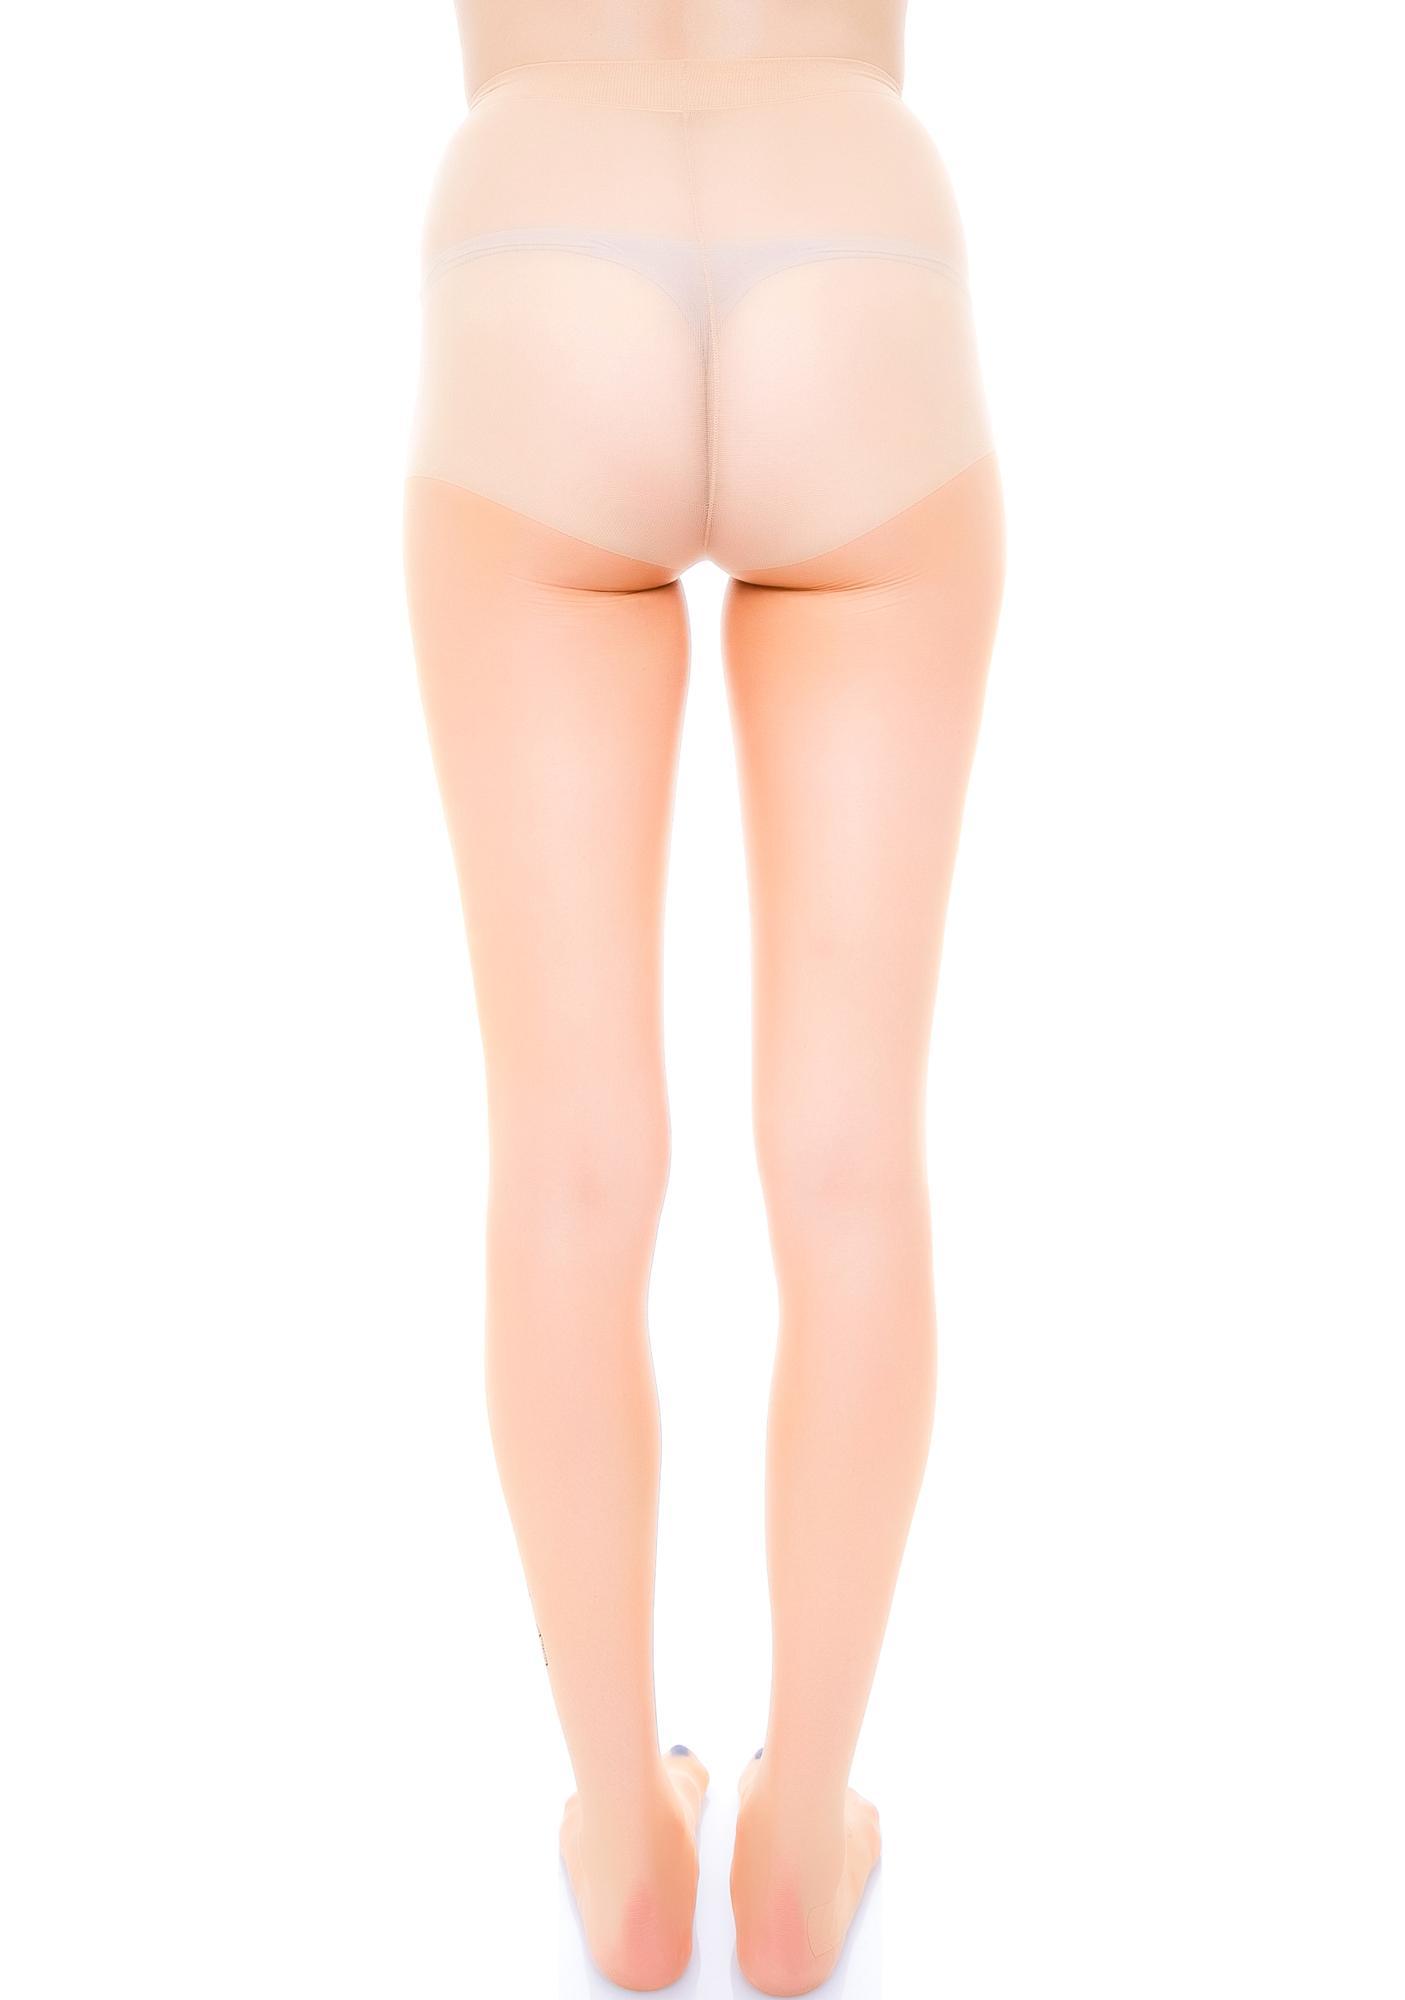 Spandex Sheer Tattoo Print Pantyhose